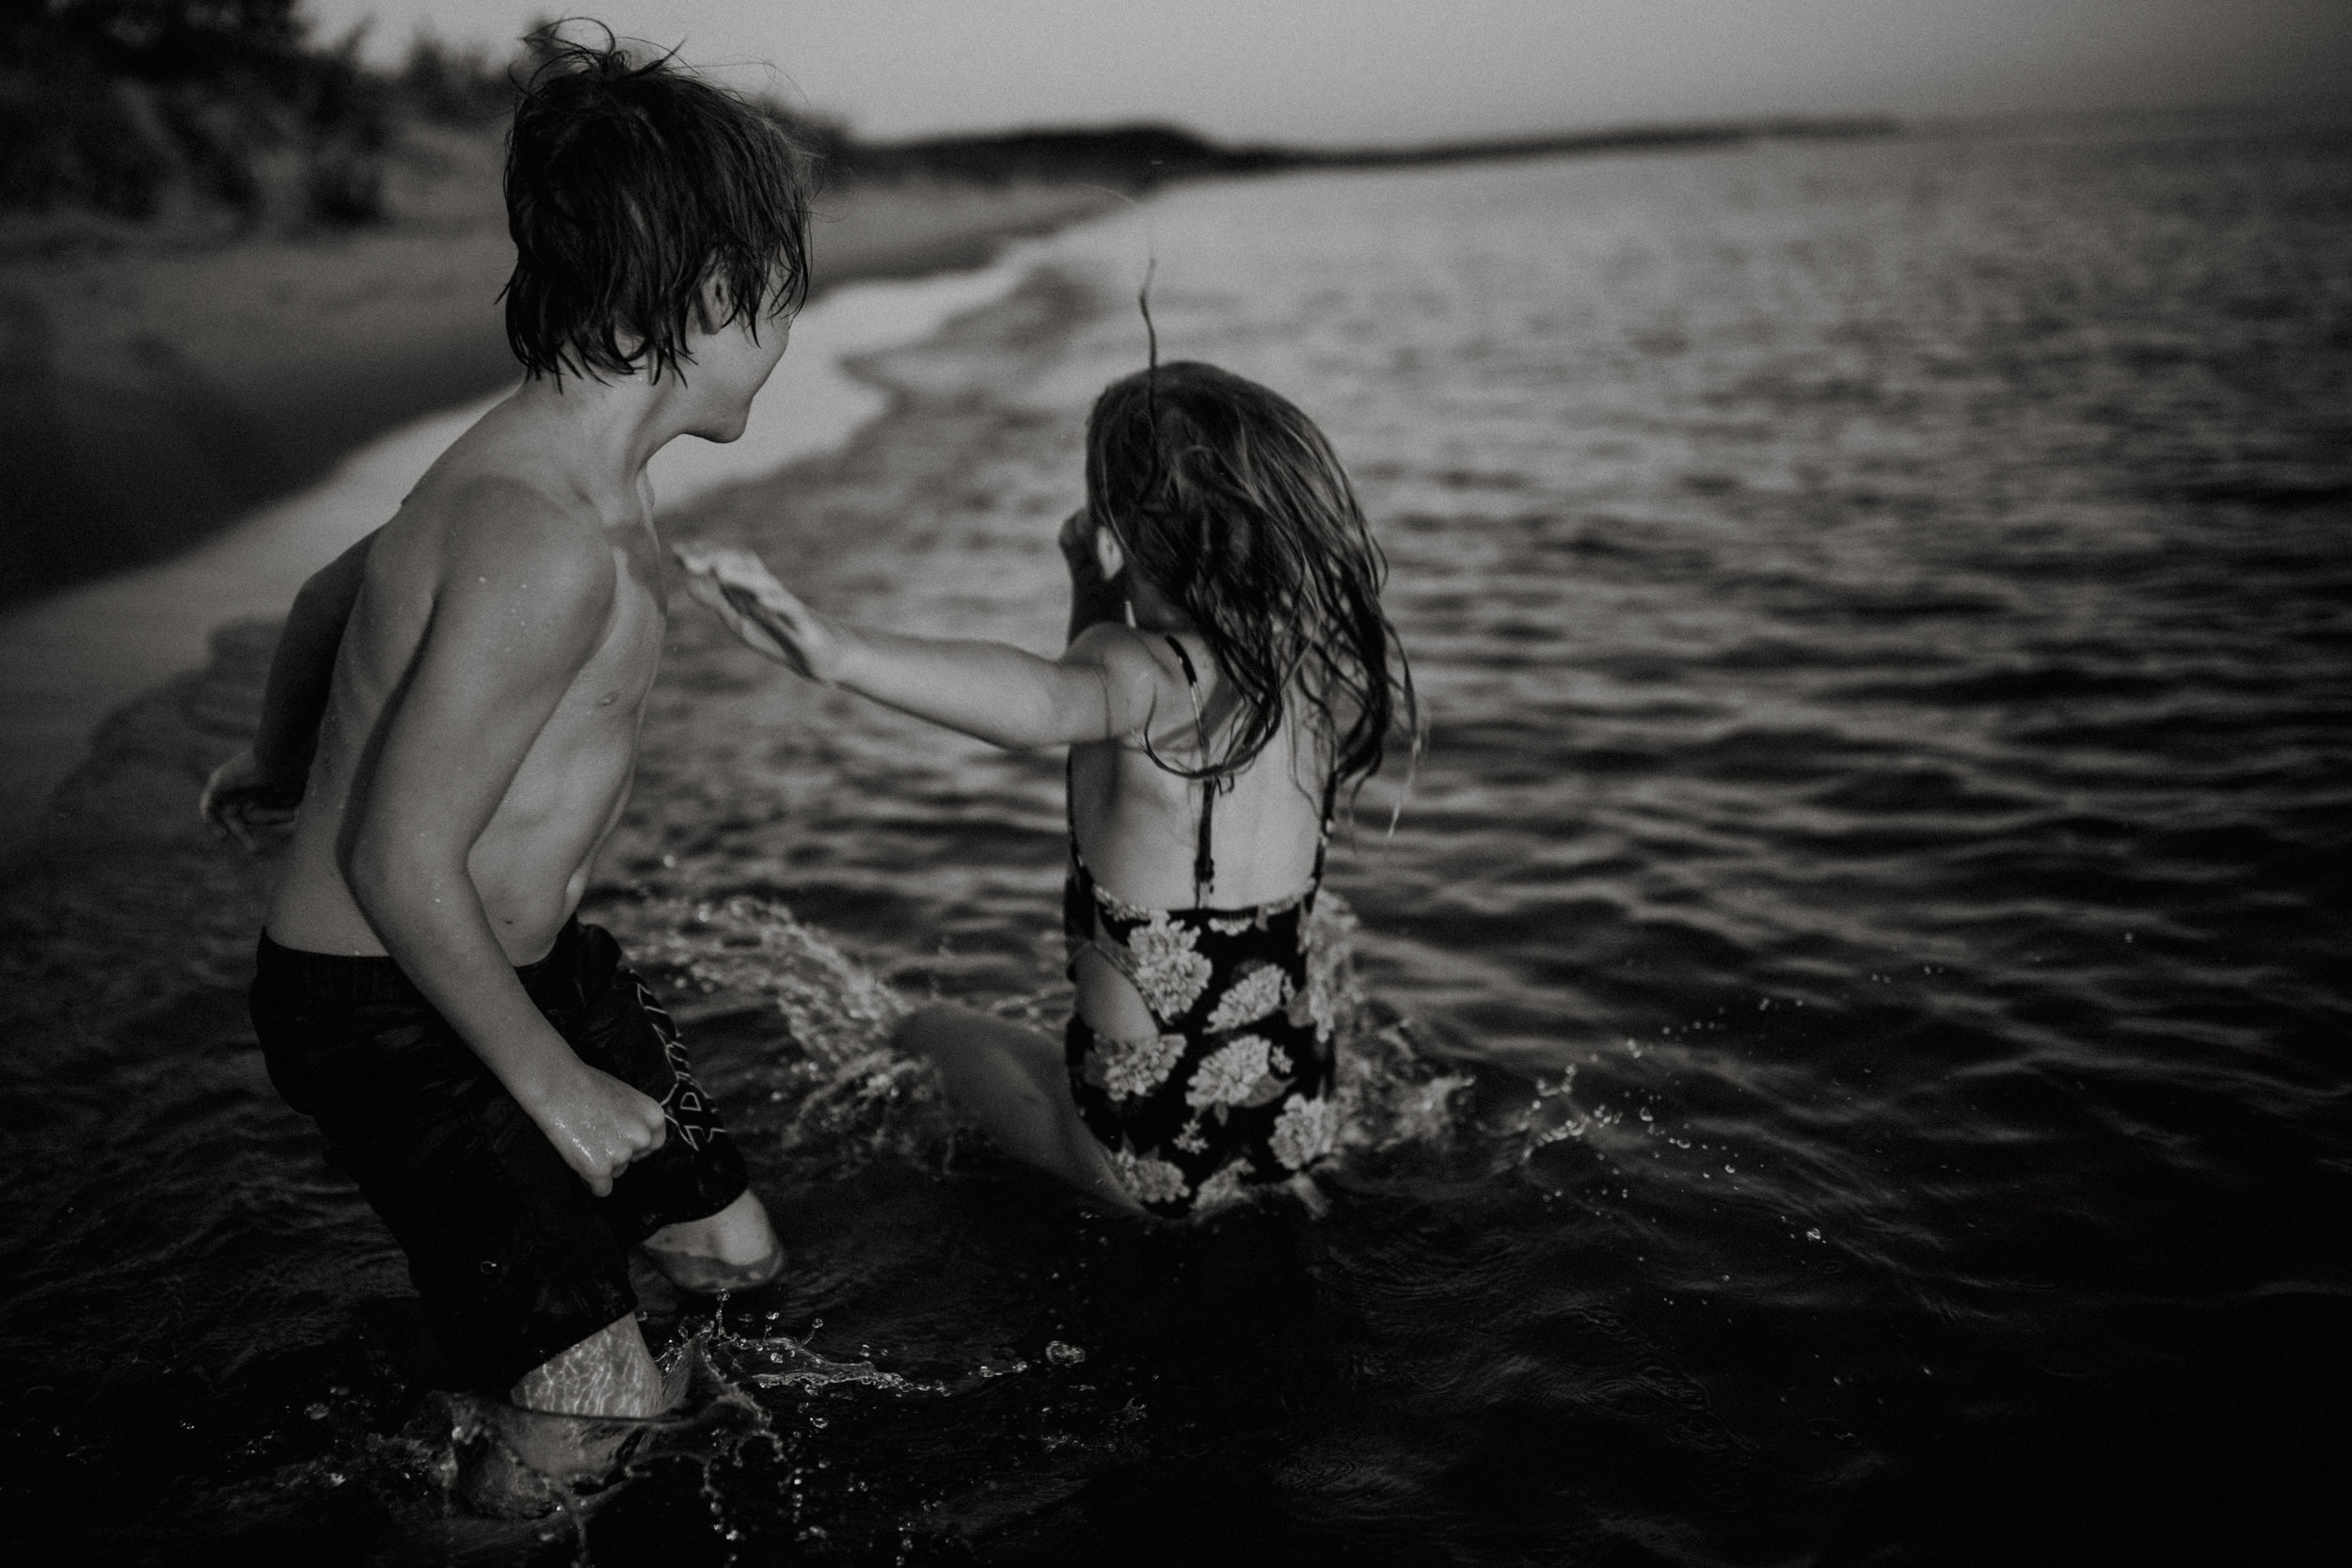 michigan-storytelling-photographer-ludington-beach-live-273.jpg